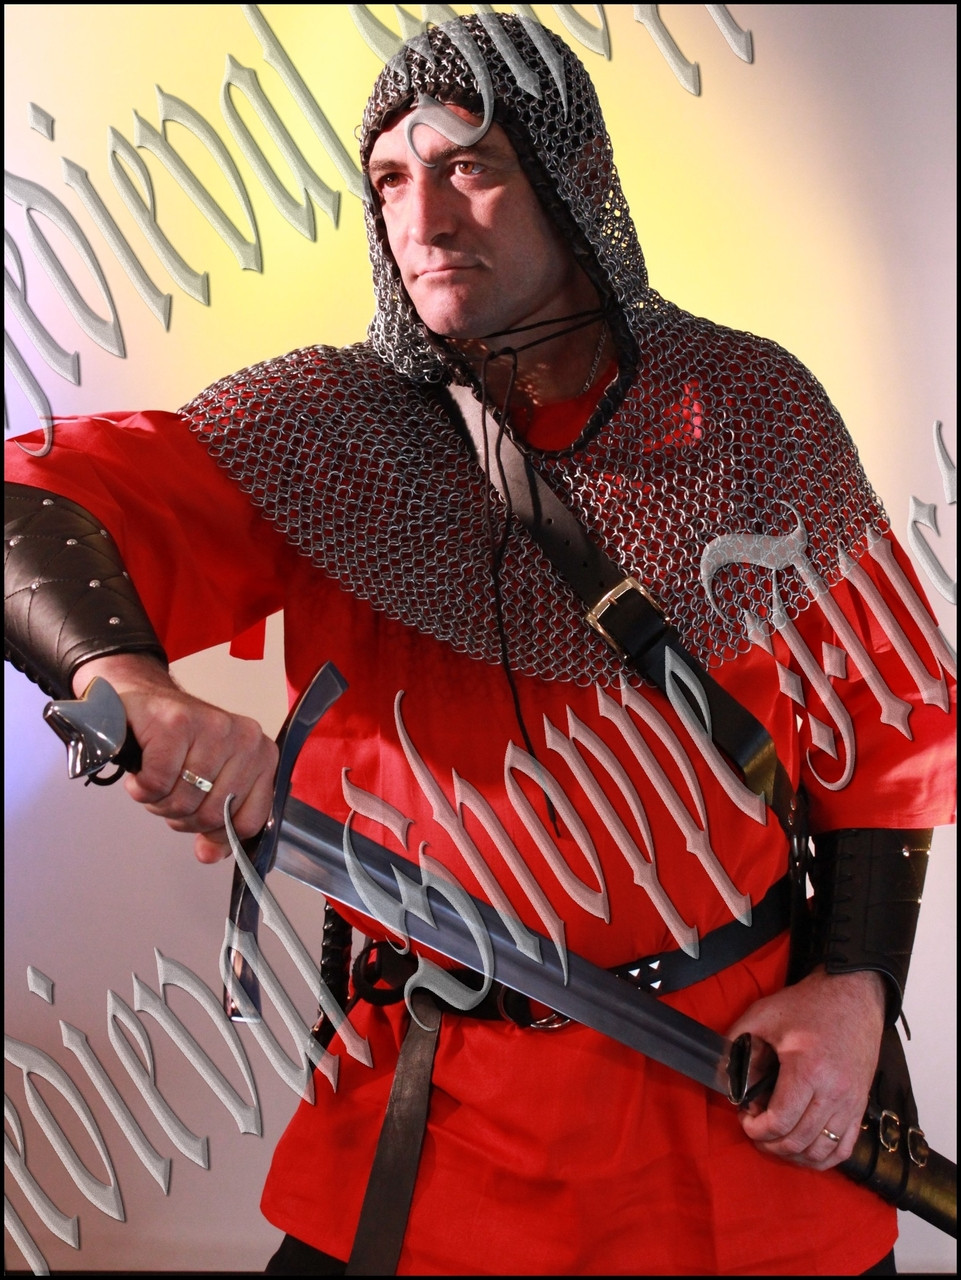 13th Century Riding Sword